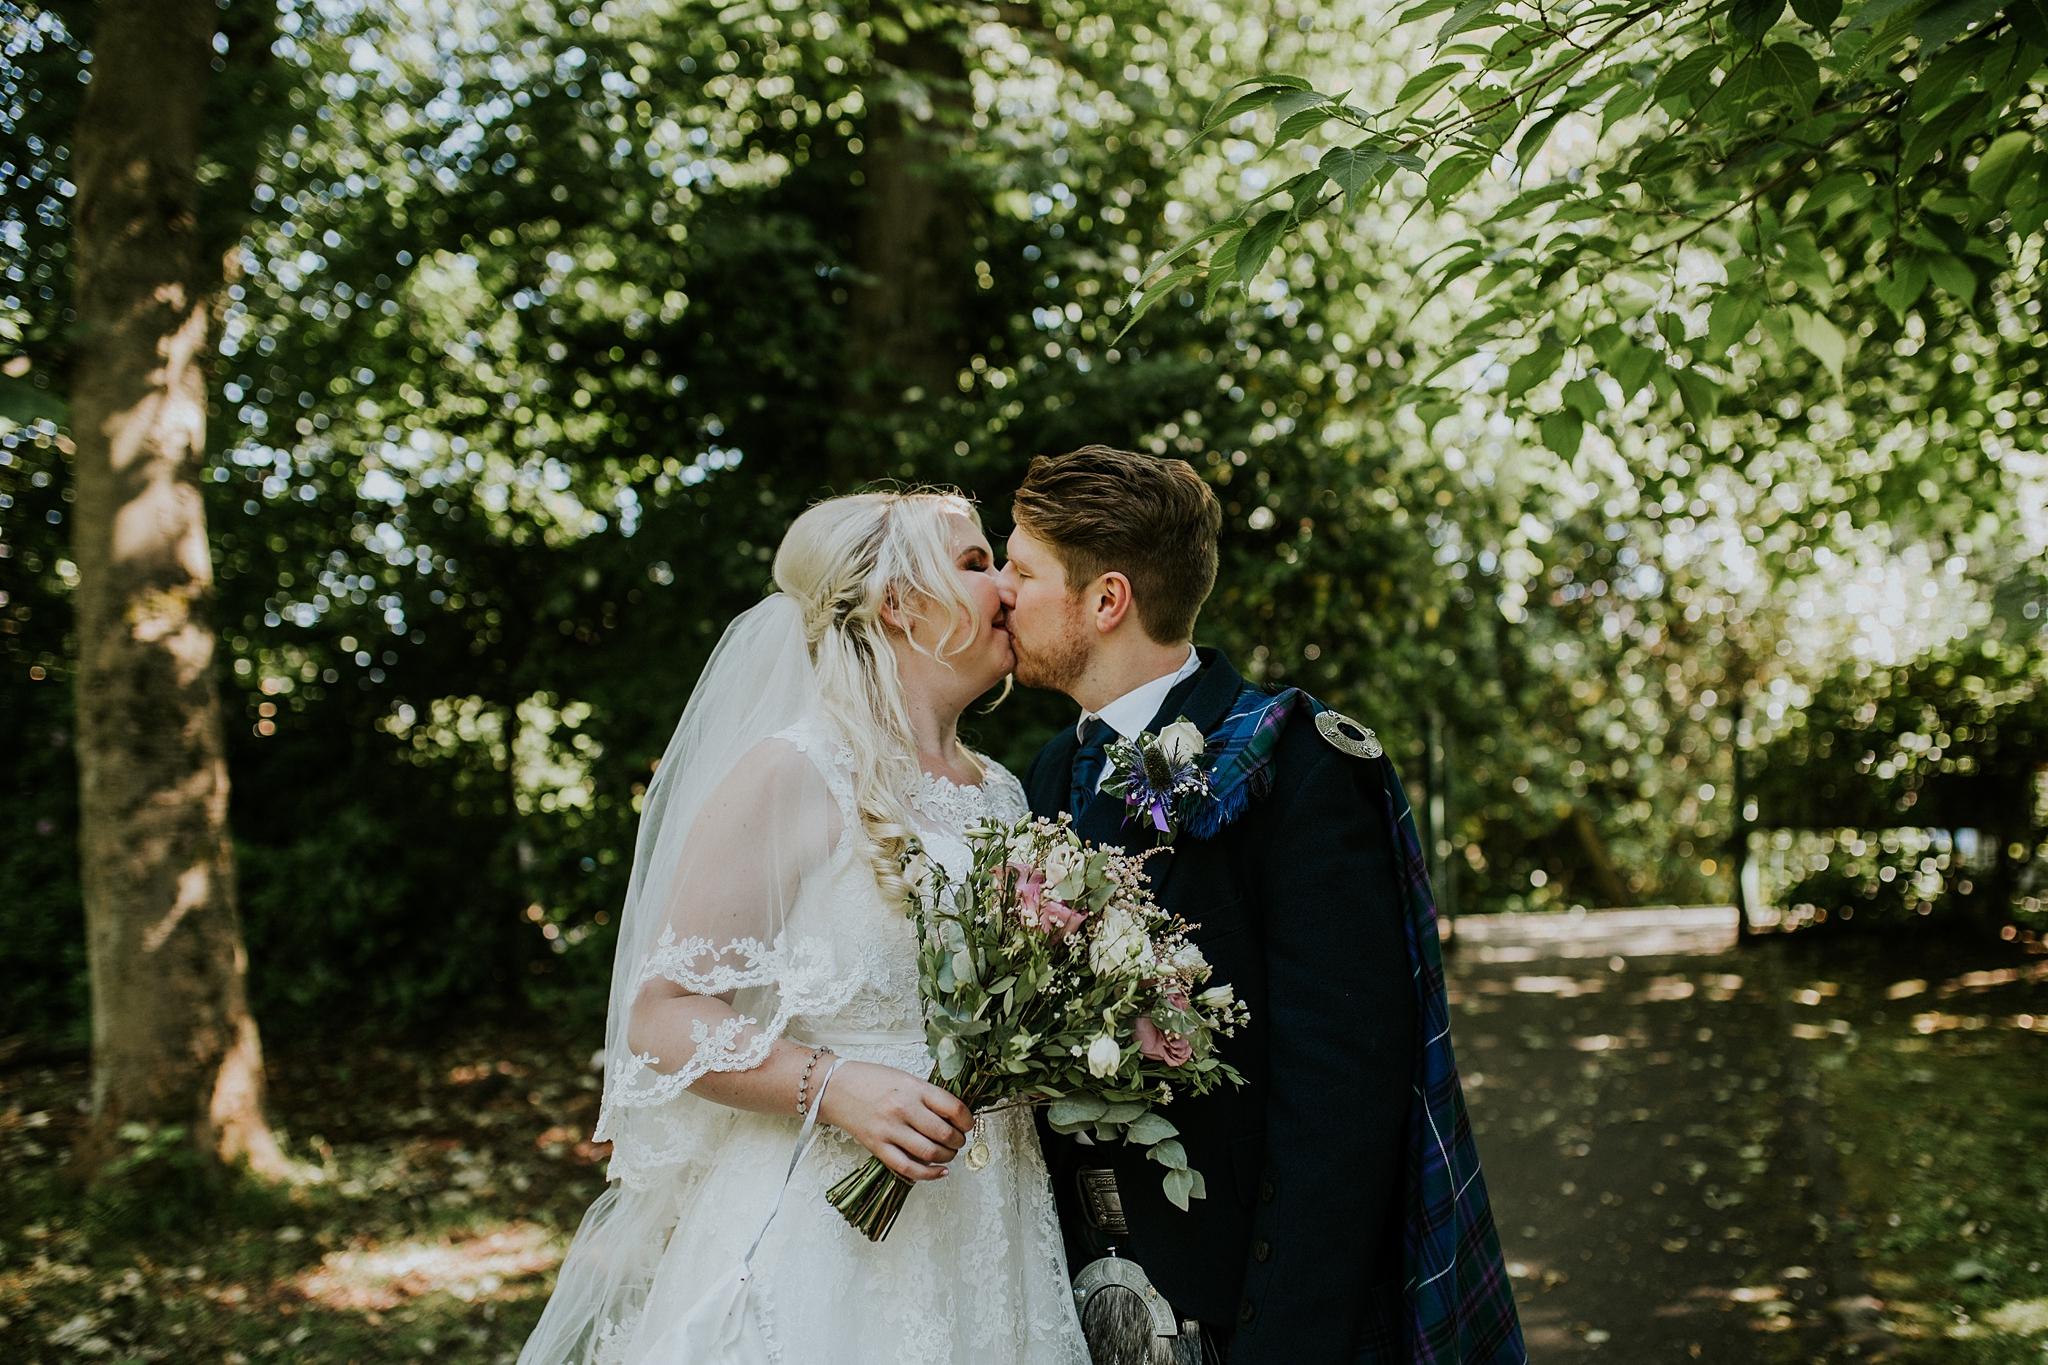 Mark_Alison_Pollockshields_Burgh_Hall_Wedding-24.JPG